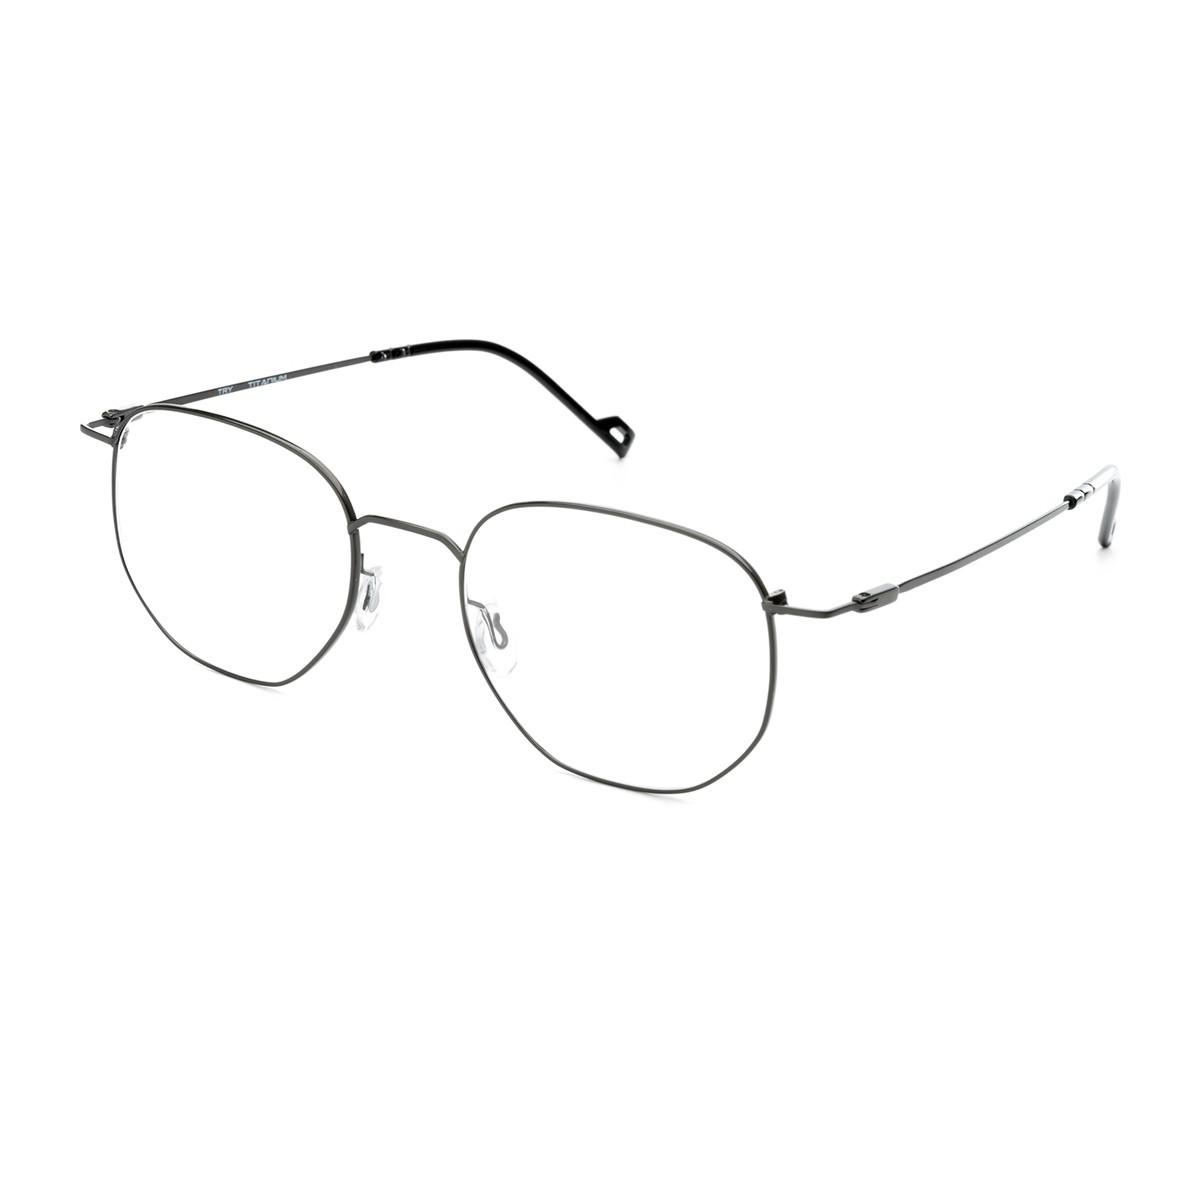 Try Titanium TY943 | Occhiali da vista Unisex